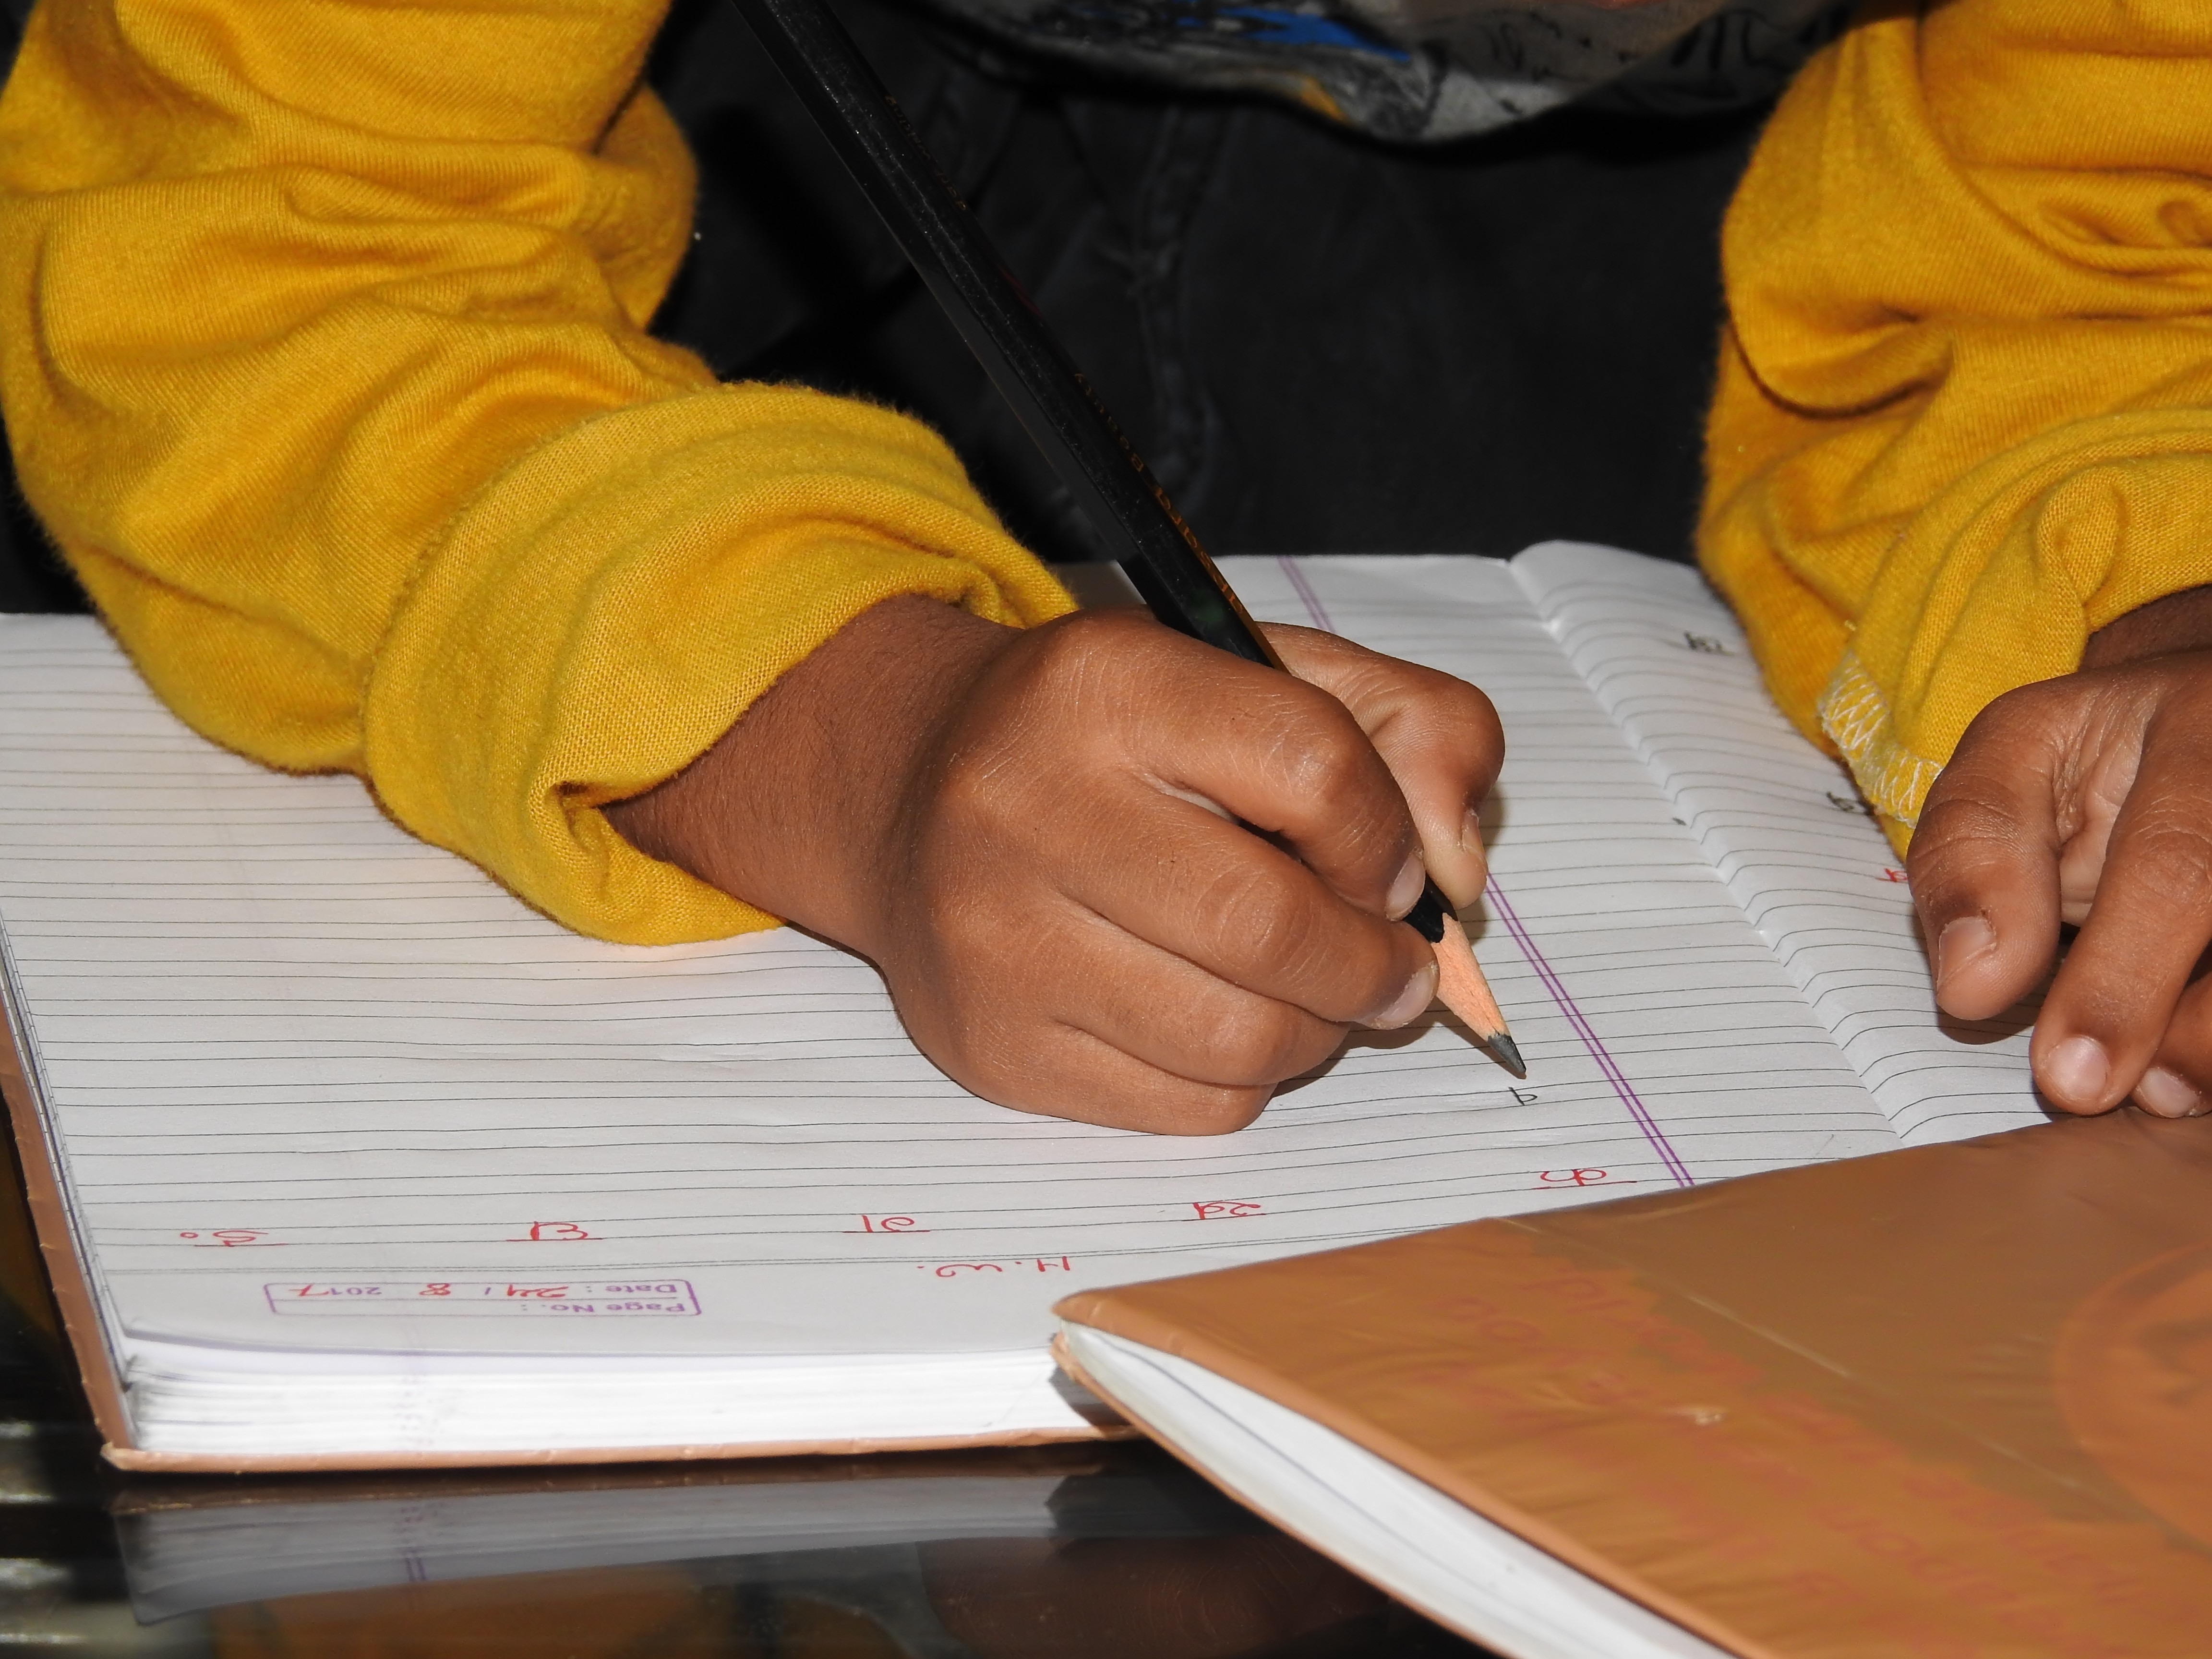 A boy wirtes in a notebook